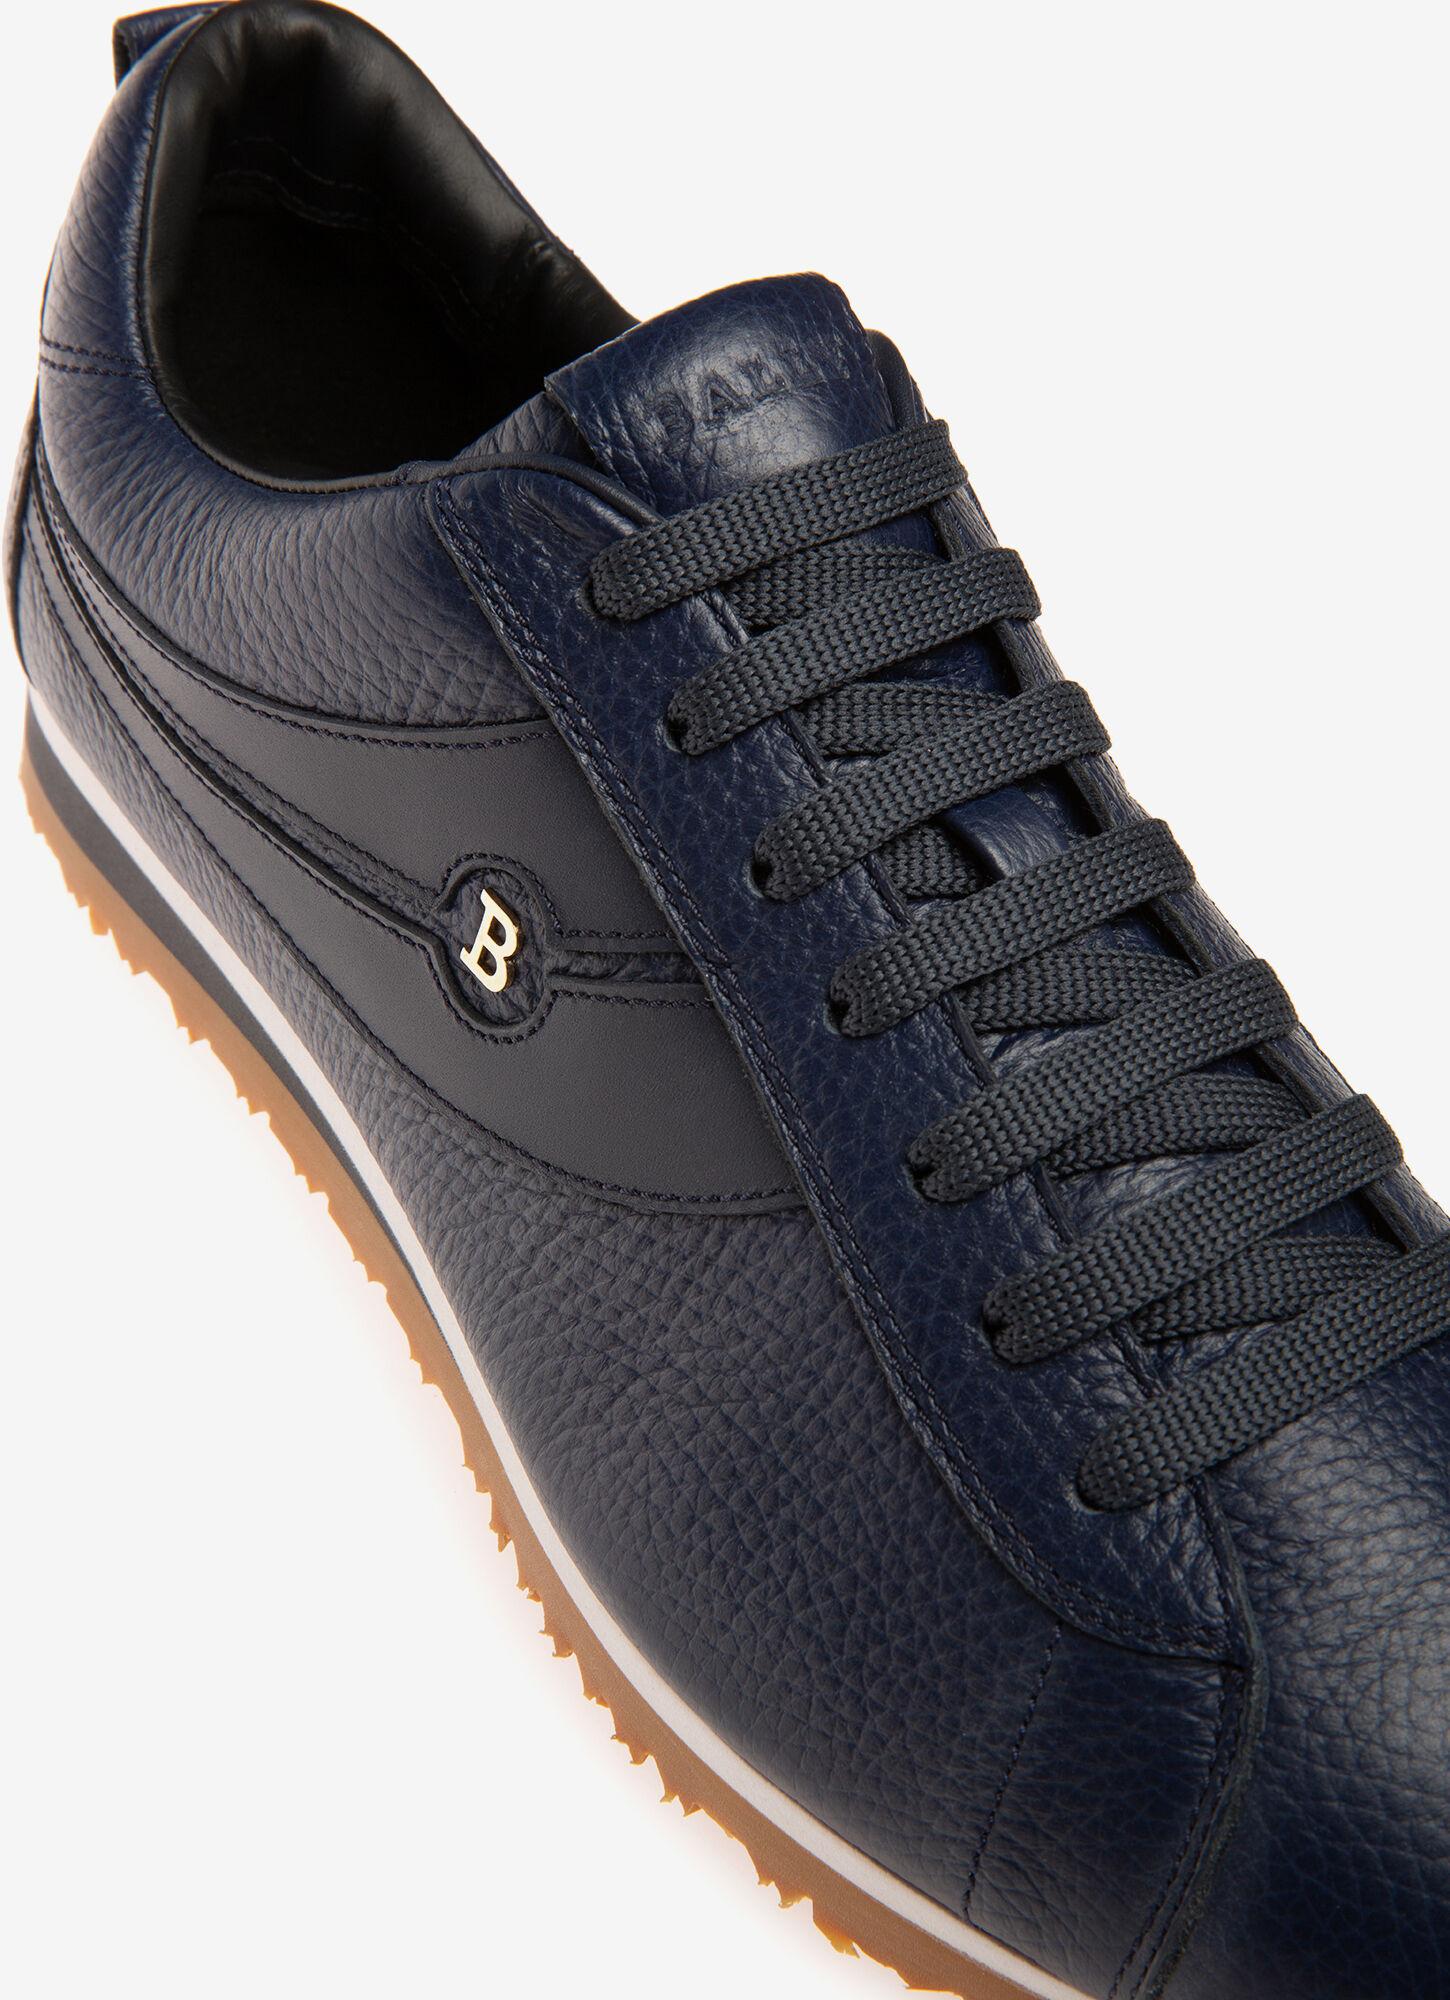 Bredy  Mens Sneaker   Navy Leather   Bally